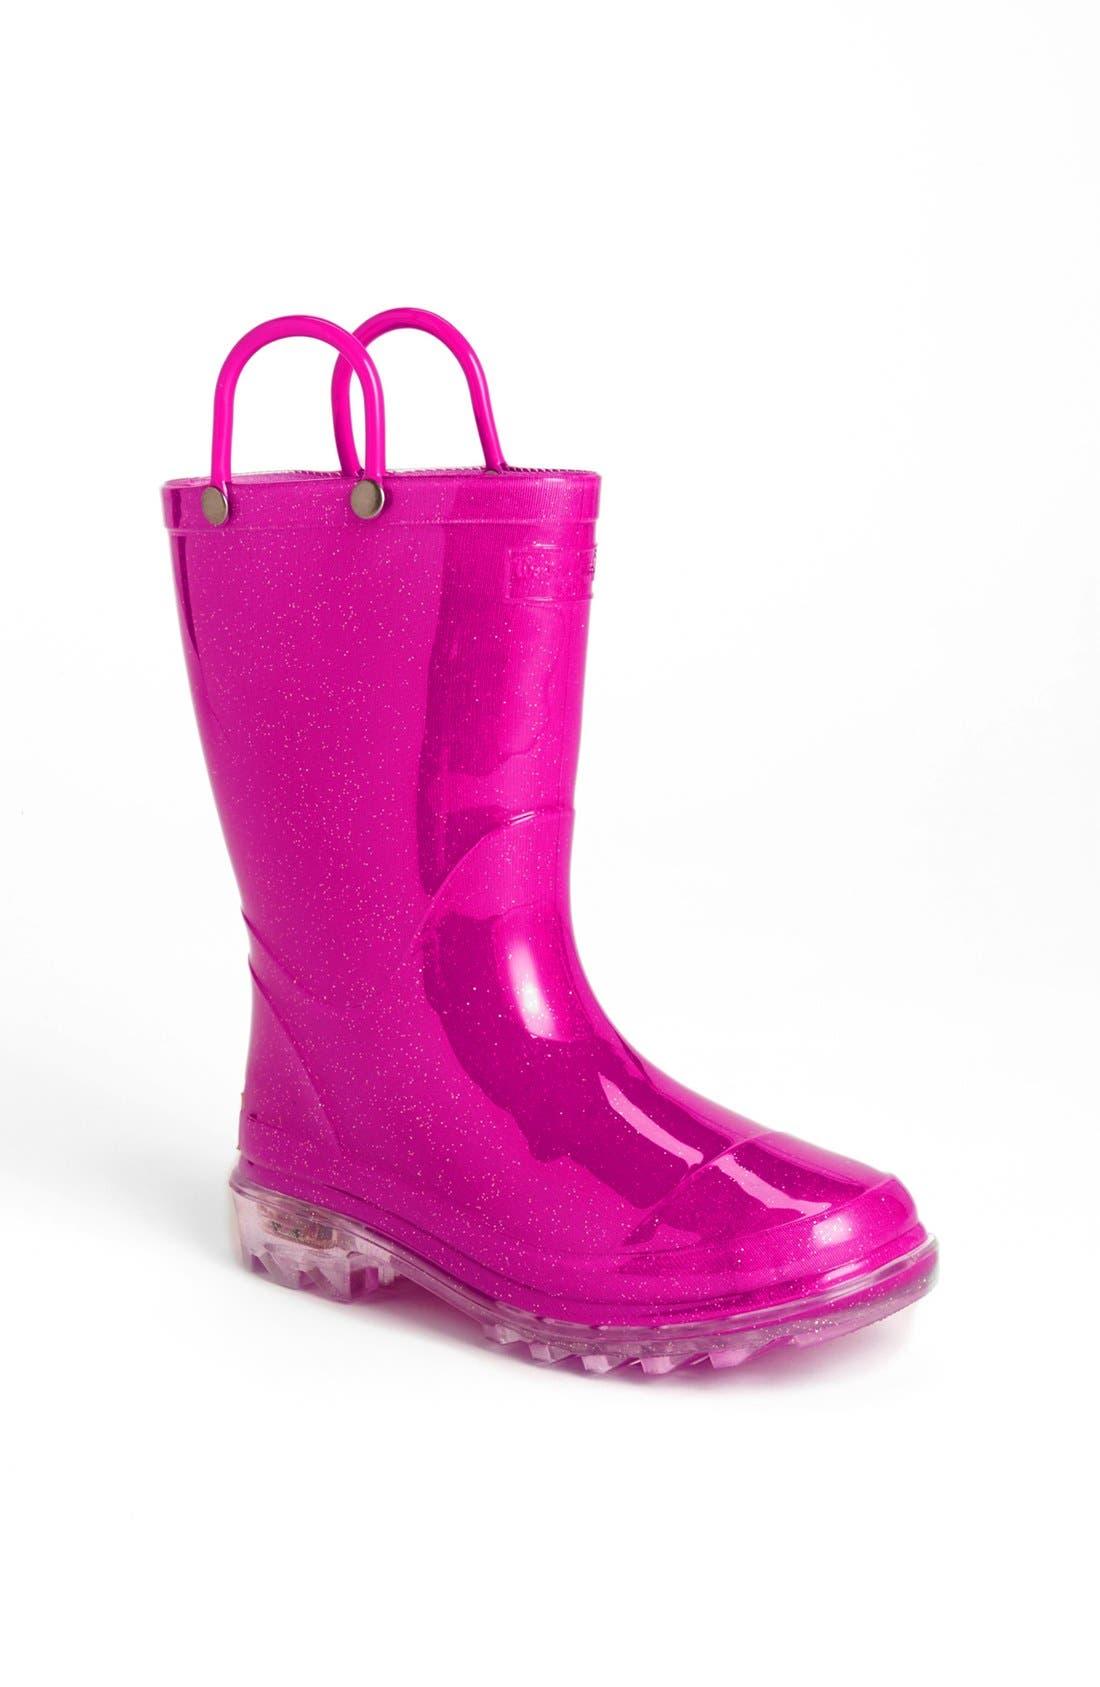 Alternate Image 1 Selected - Western Chief Light-Up Glitter Rain Boot (Toddler & Little Kid)